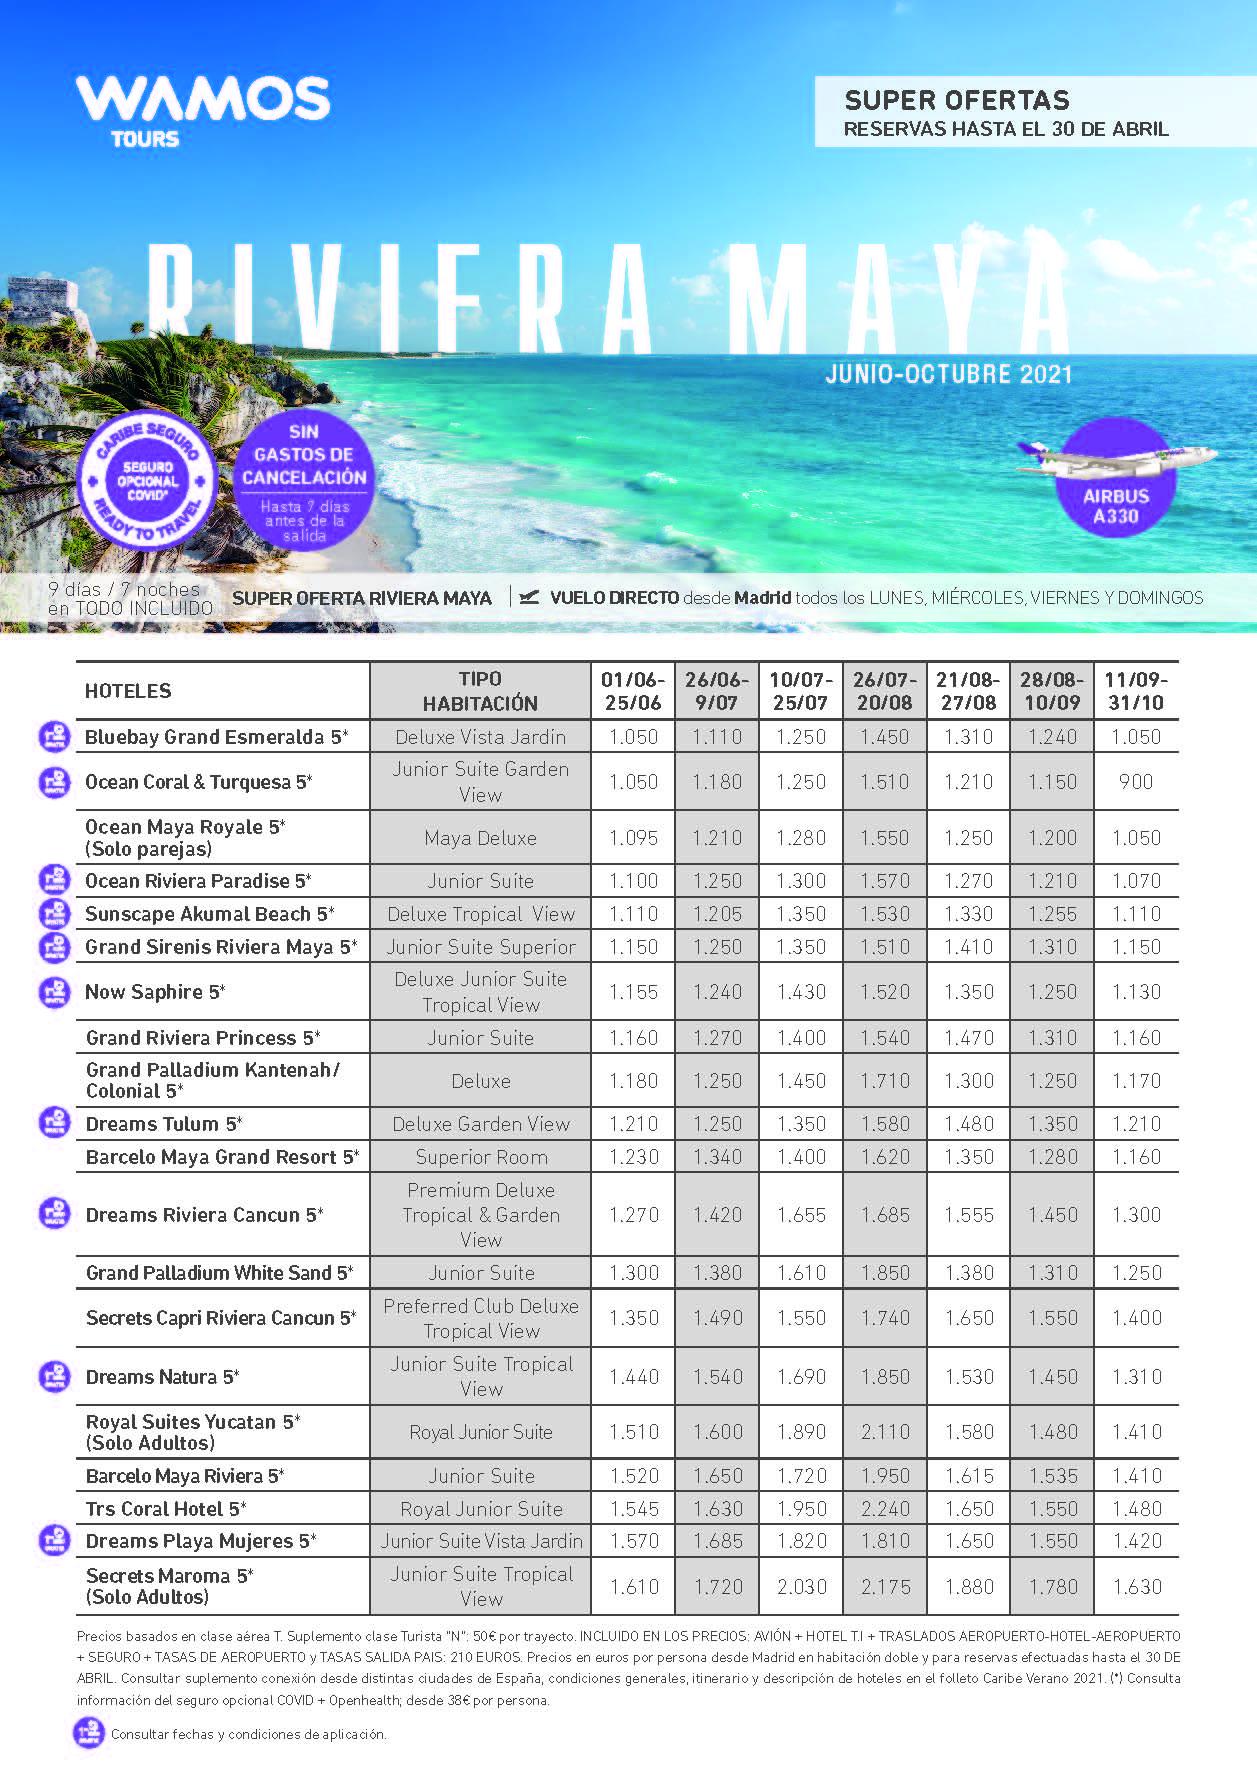 Super Ofertas Wamos Tours Riviera Maya Verano 2021 reservas hasta 30 de abril